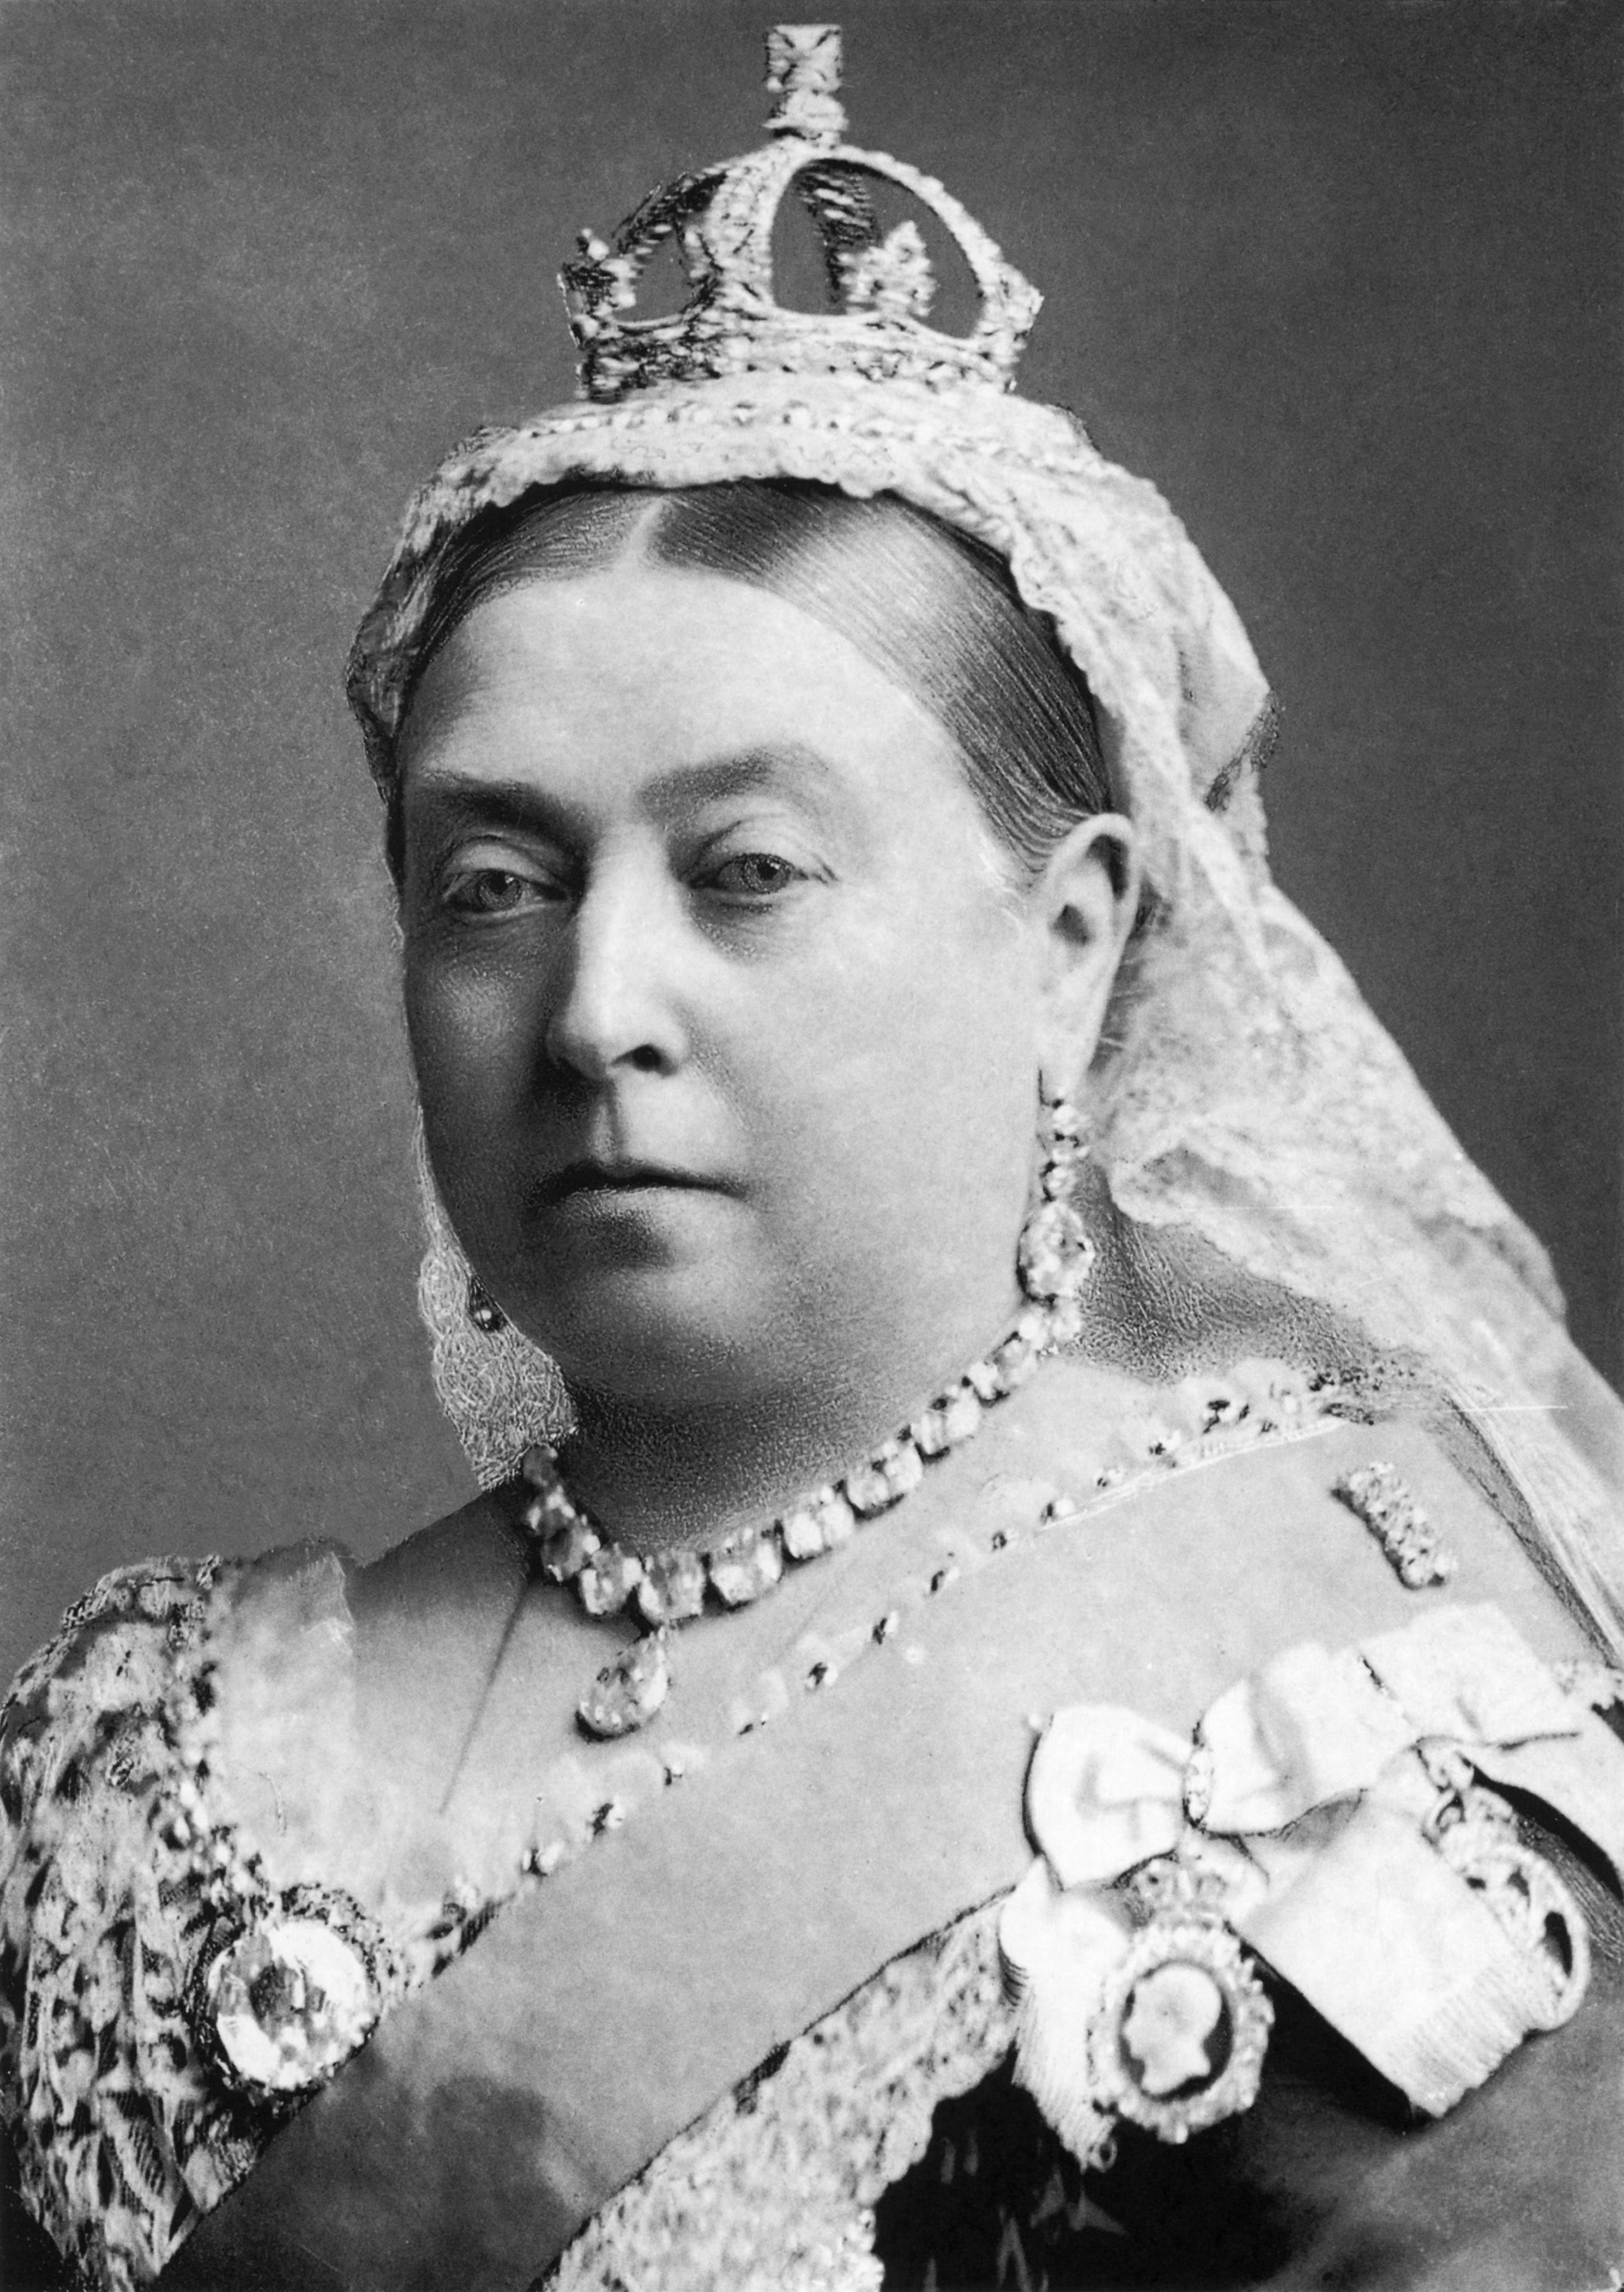 Bassano: Queen Victoria